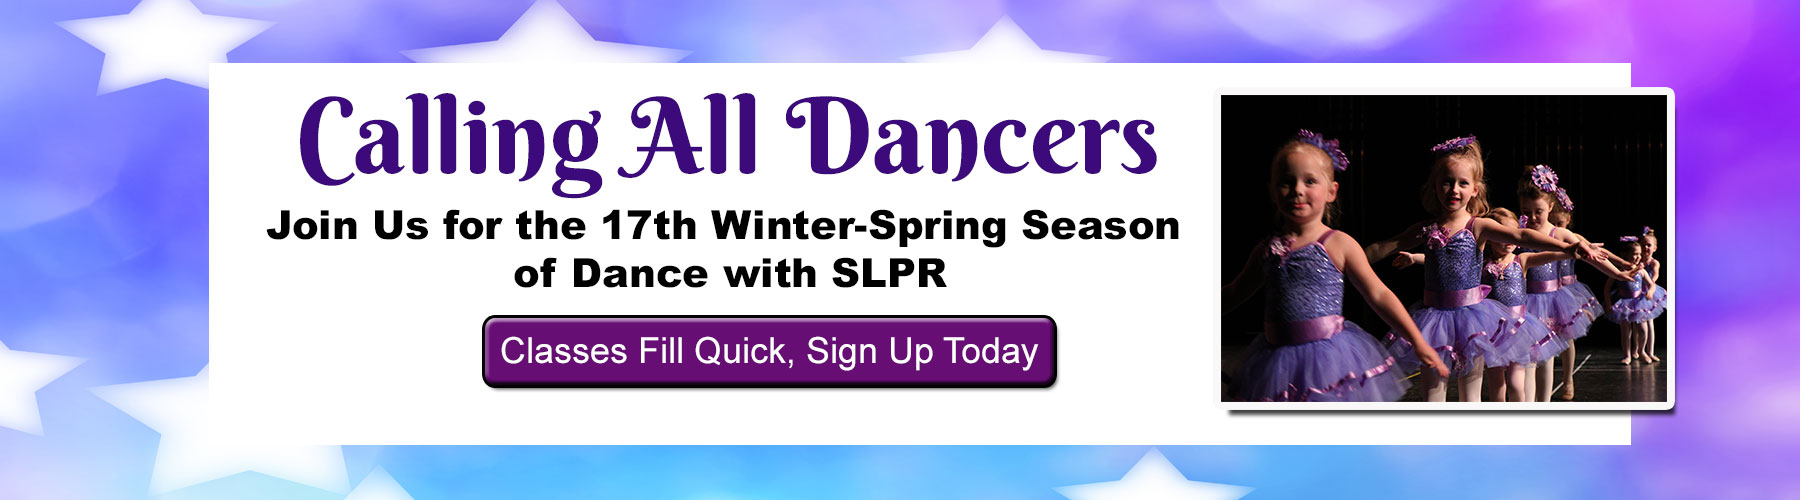 Come Dance with SLPR